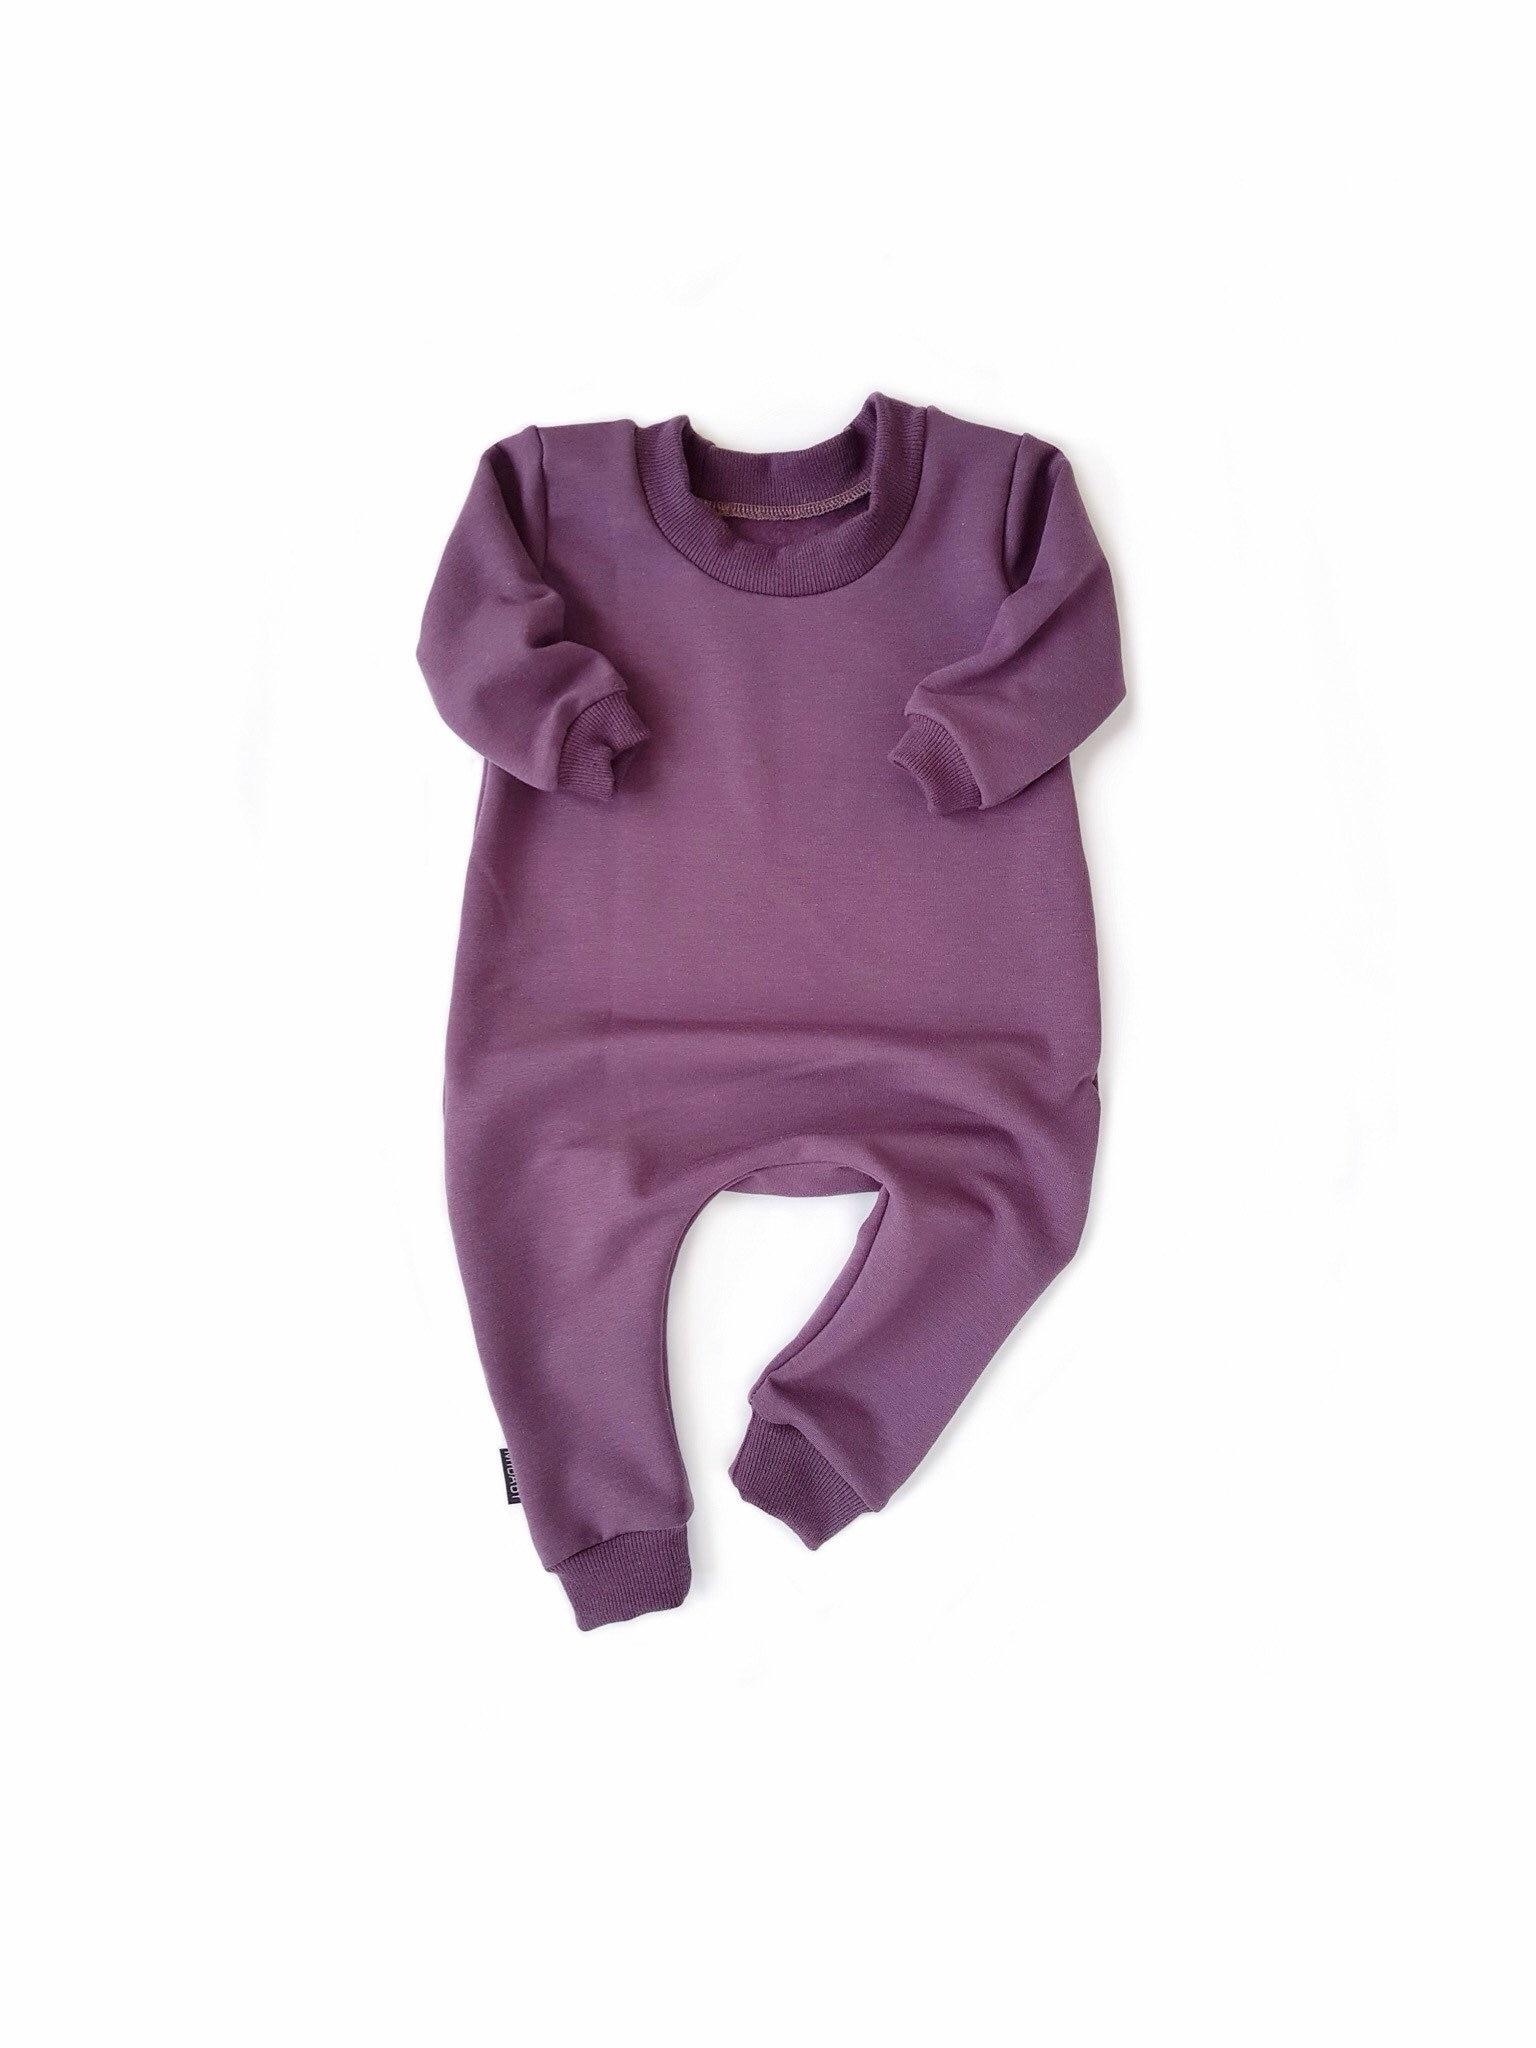 a75e4ab5d4d7 PLUM Sweatshirt Baby Romper   Toddler Romper One Piece Zipper ...